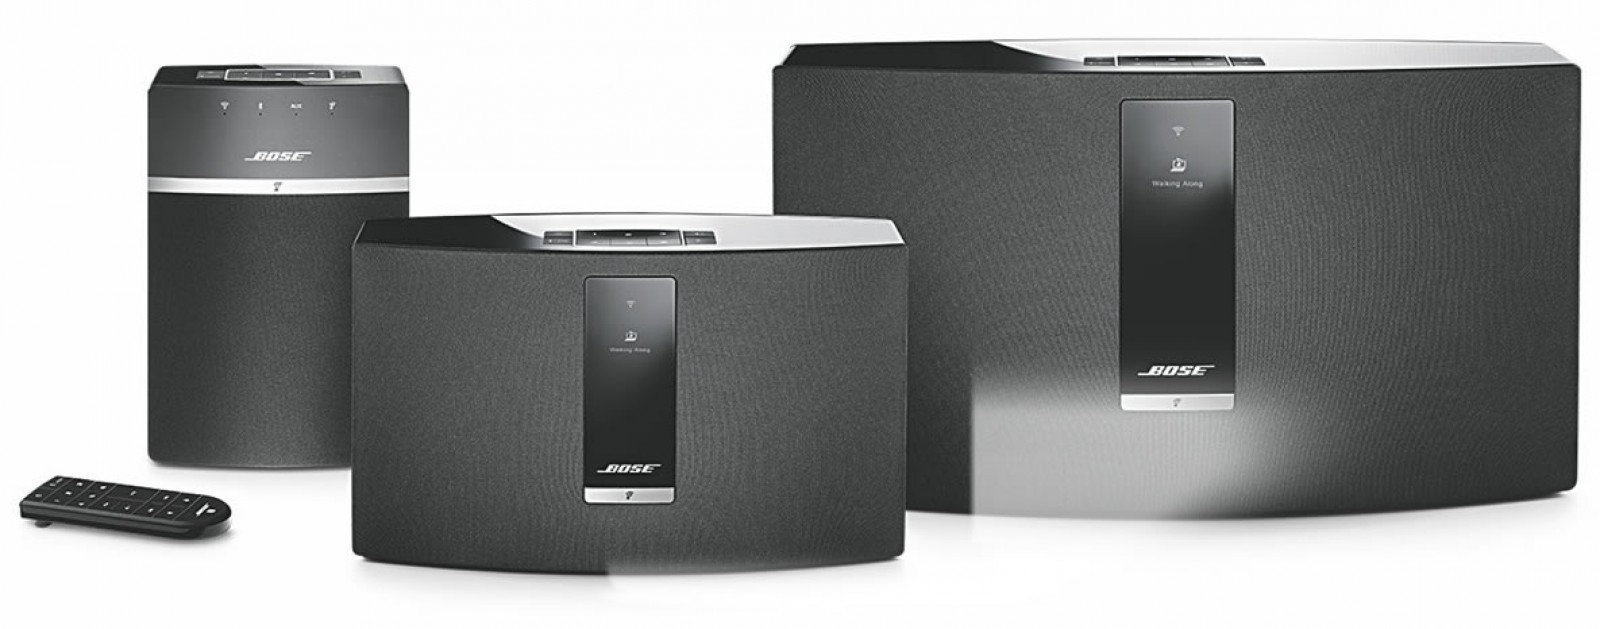 Calm Radio Internet Radios Support Bose Internet Radio Models How To Stream Your Calming Music For Sleep